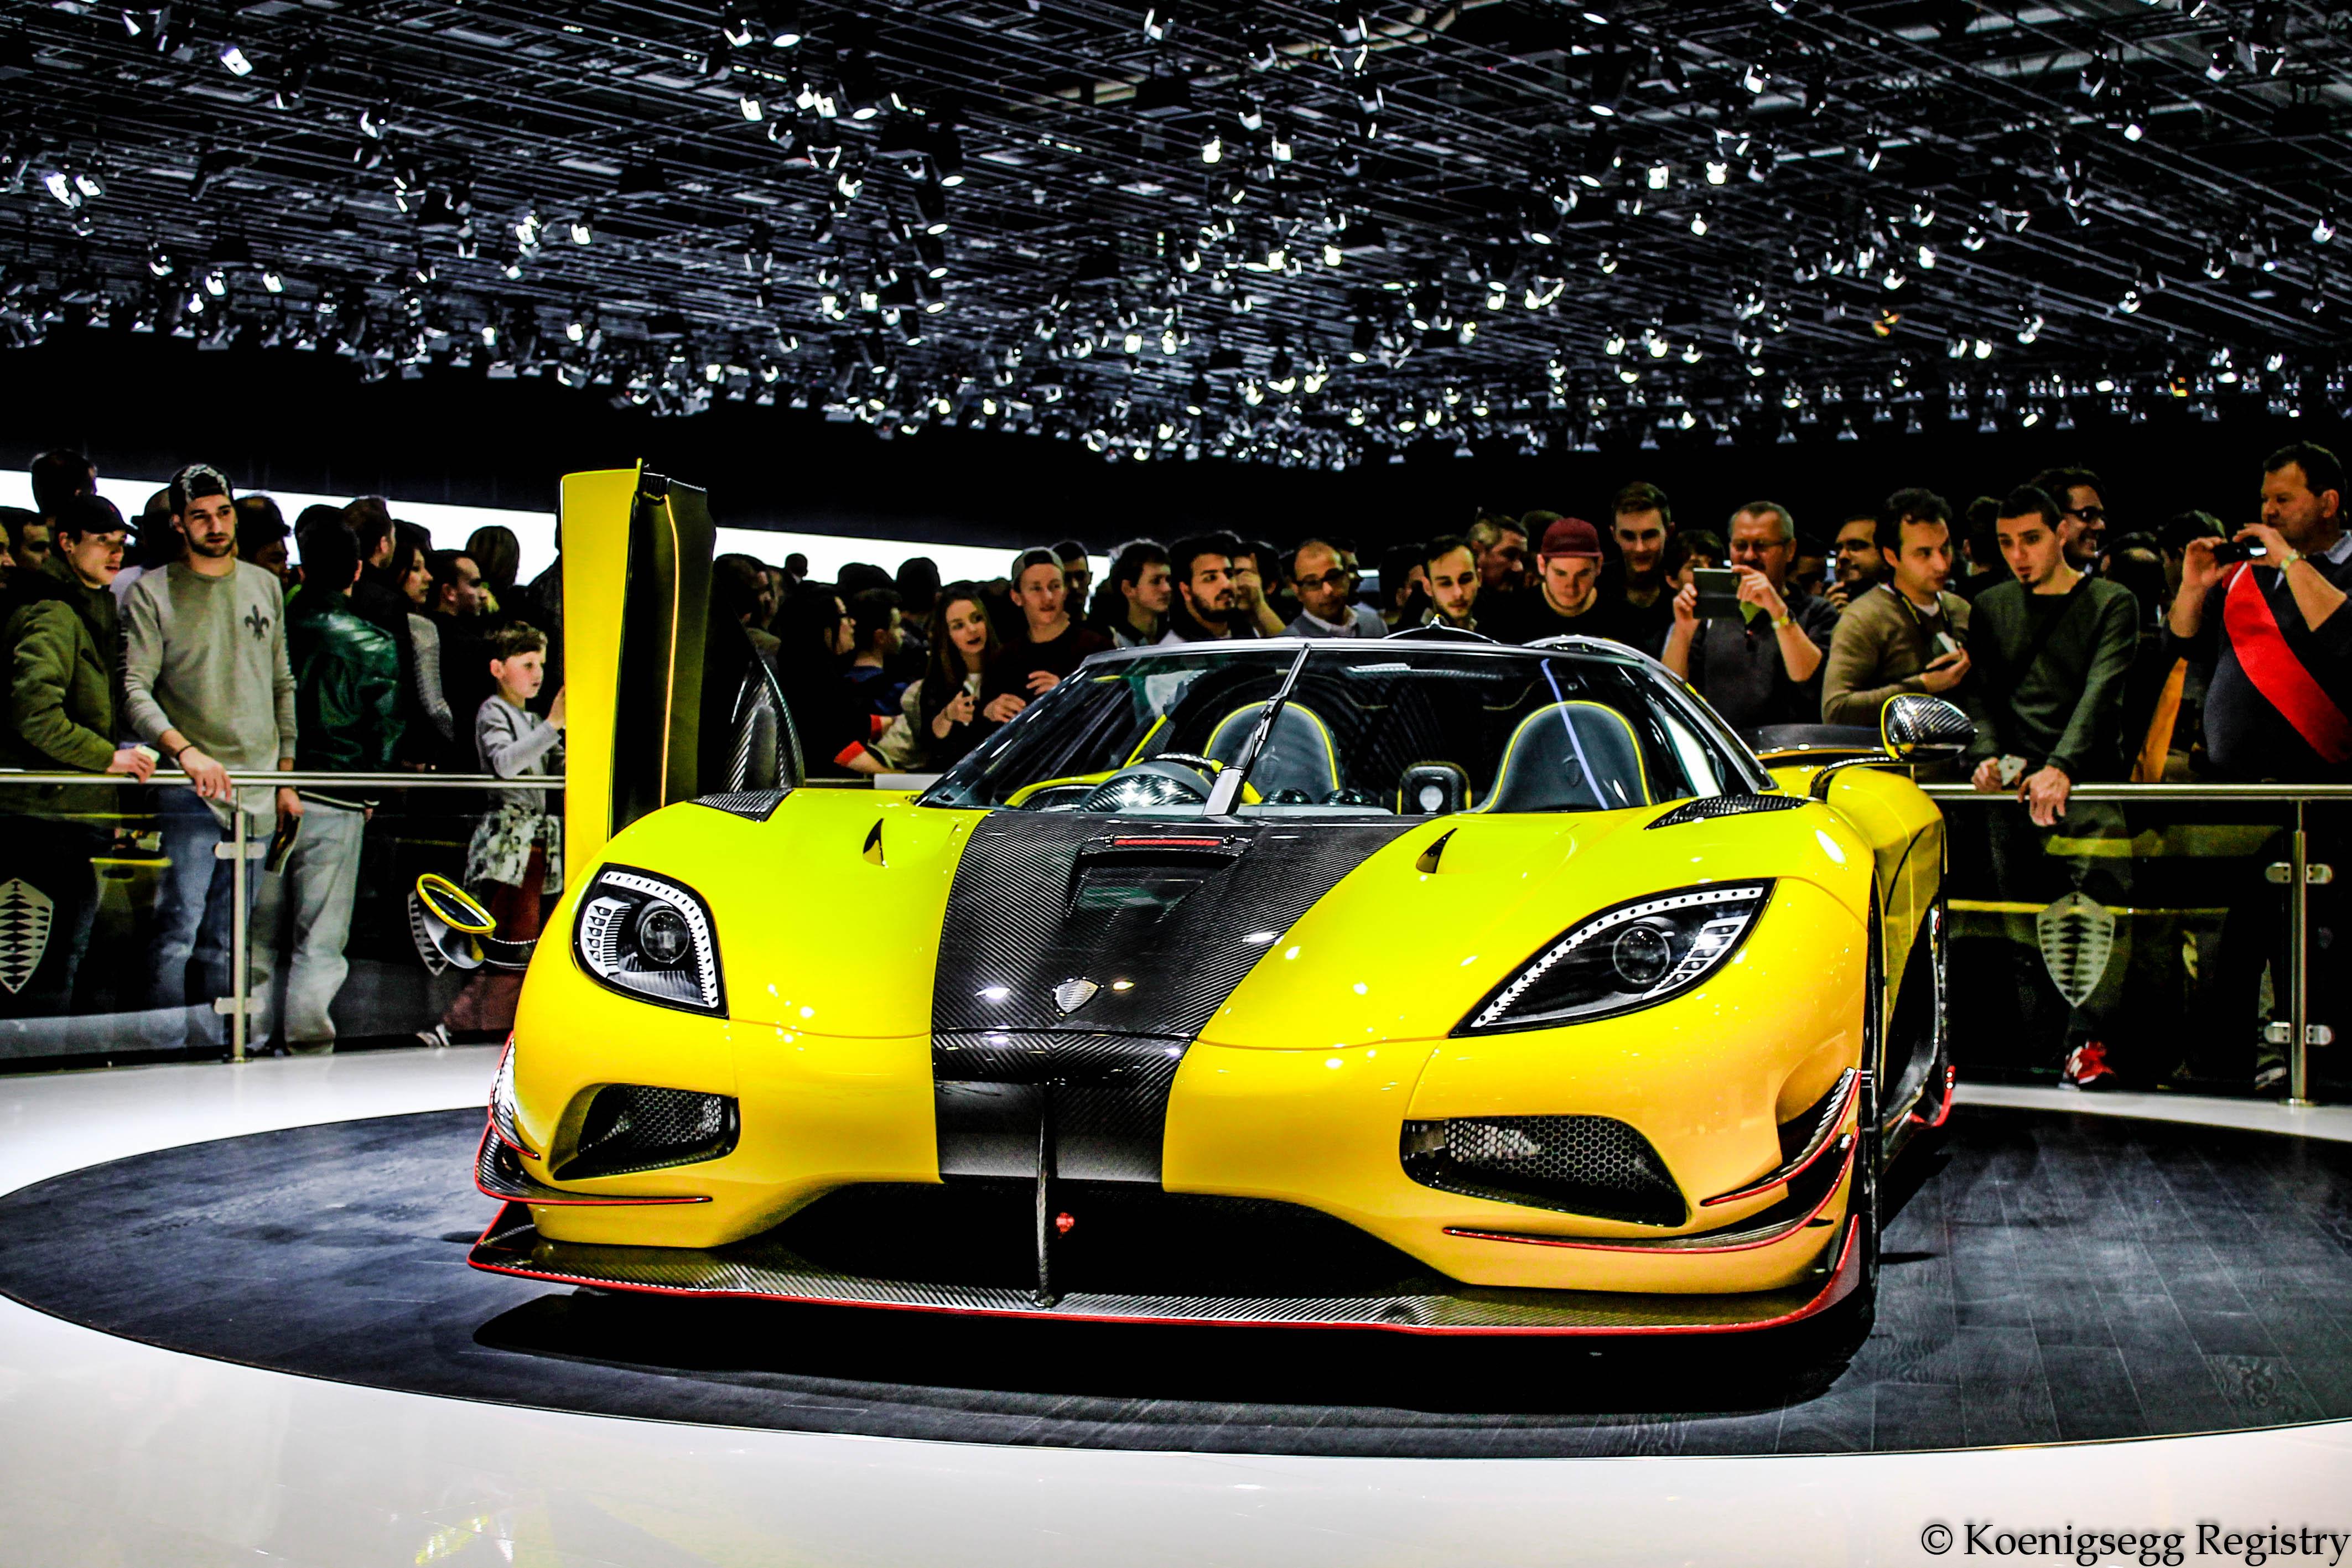 "#118 Agera RS ""ML"" - Loke Yellow w/red accents / black int. RHD-img_3643.jpg"